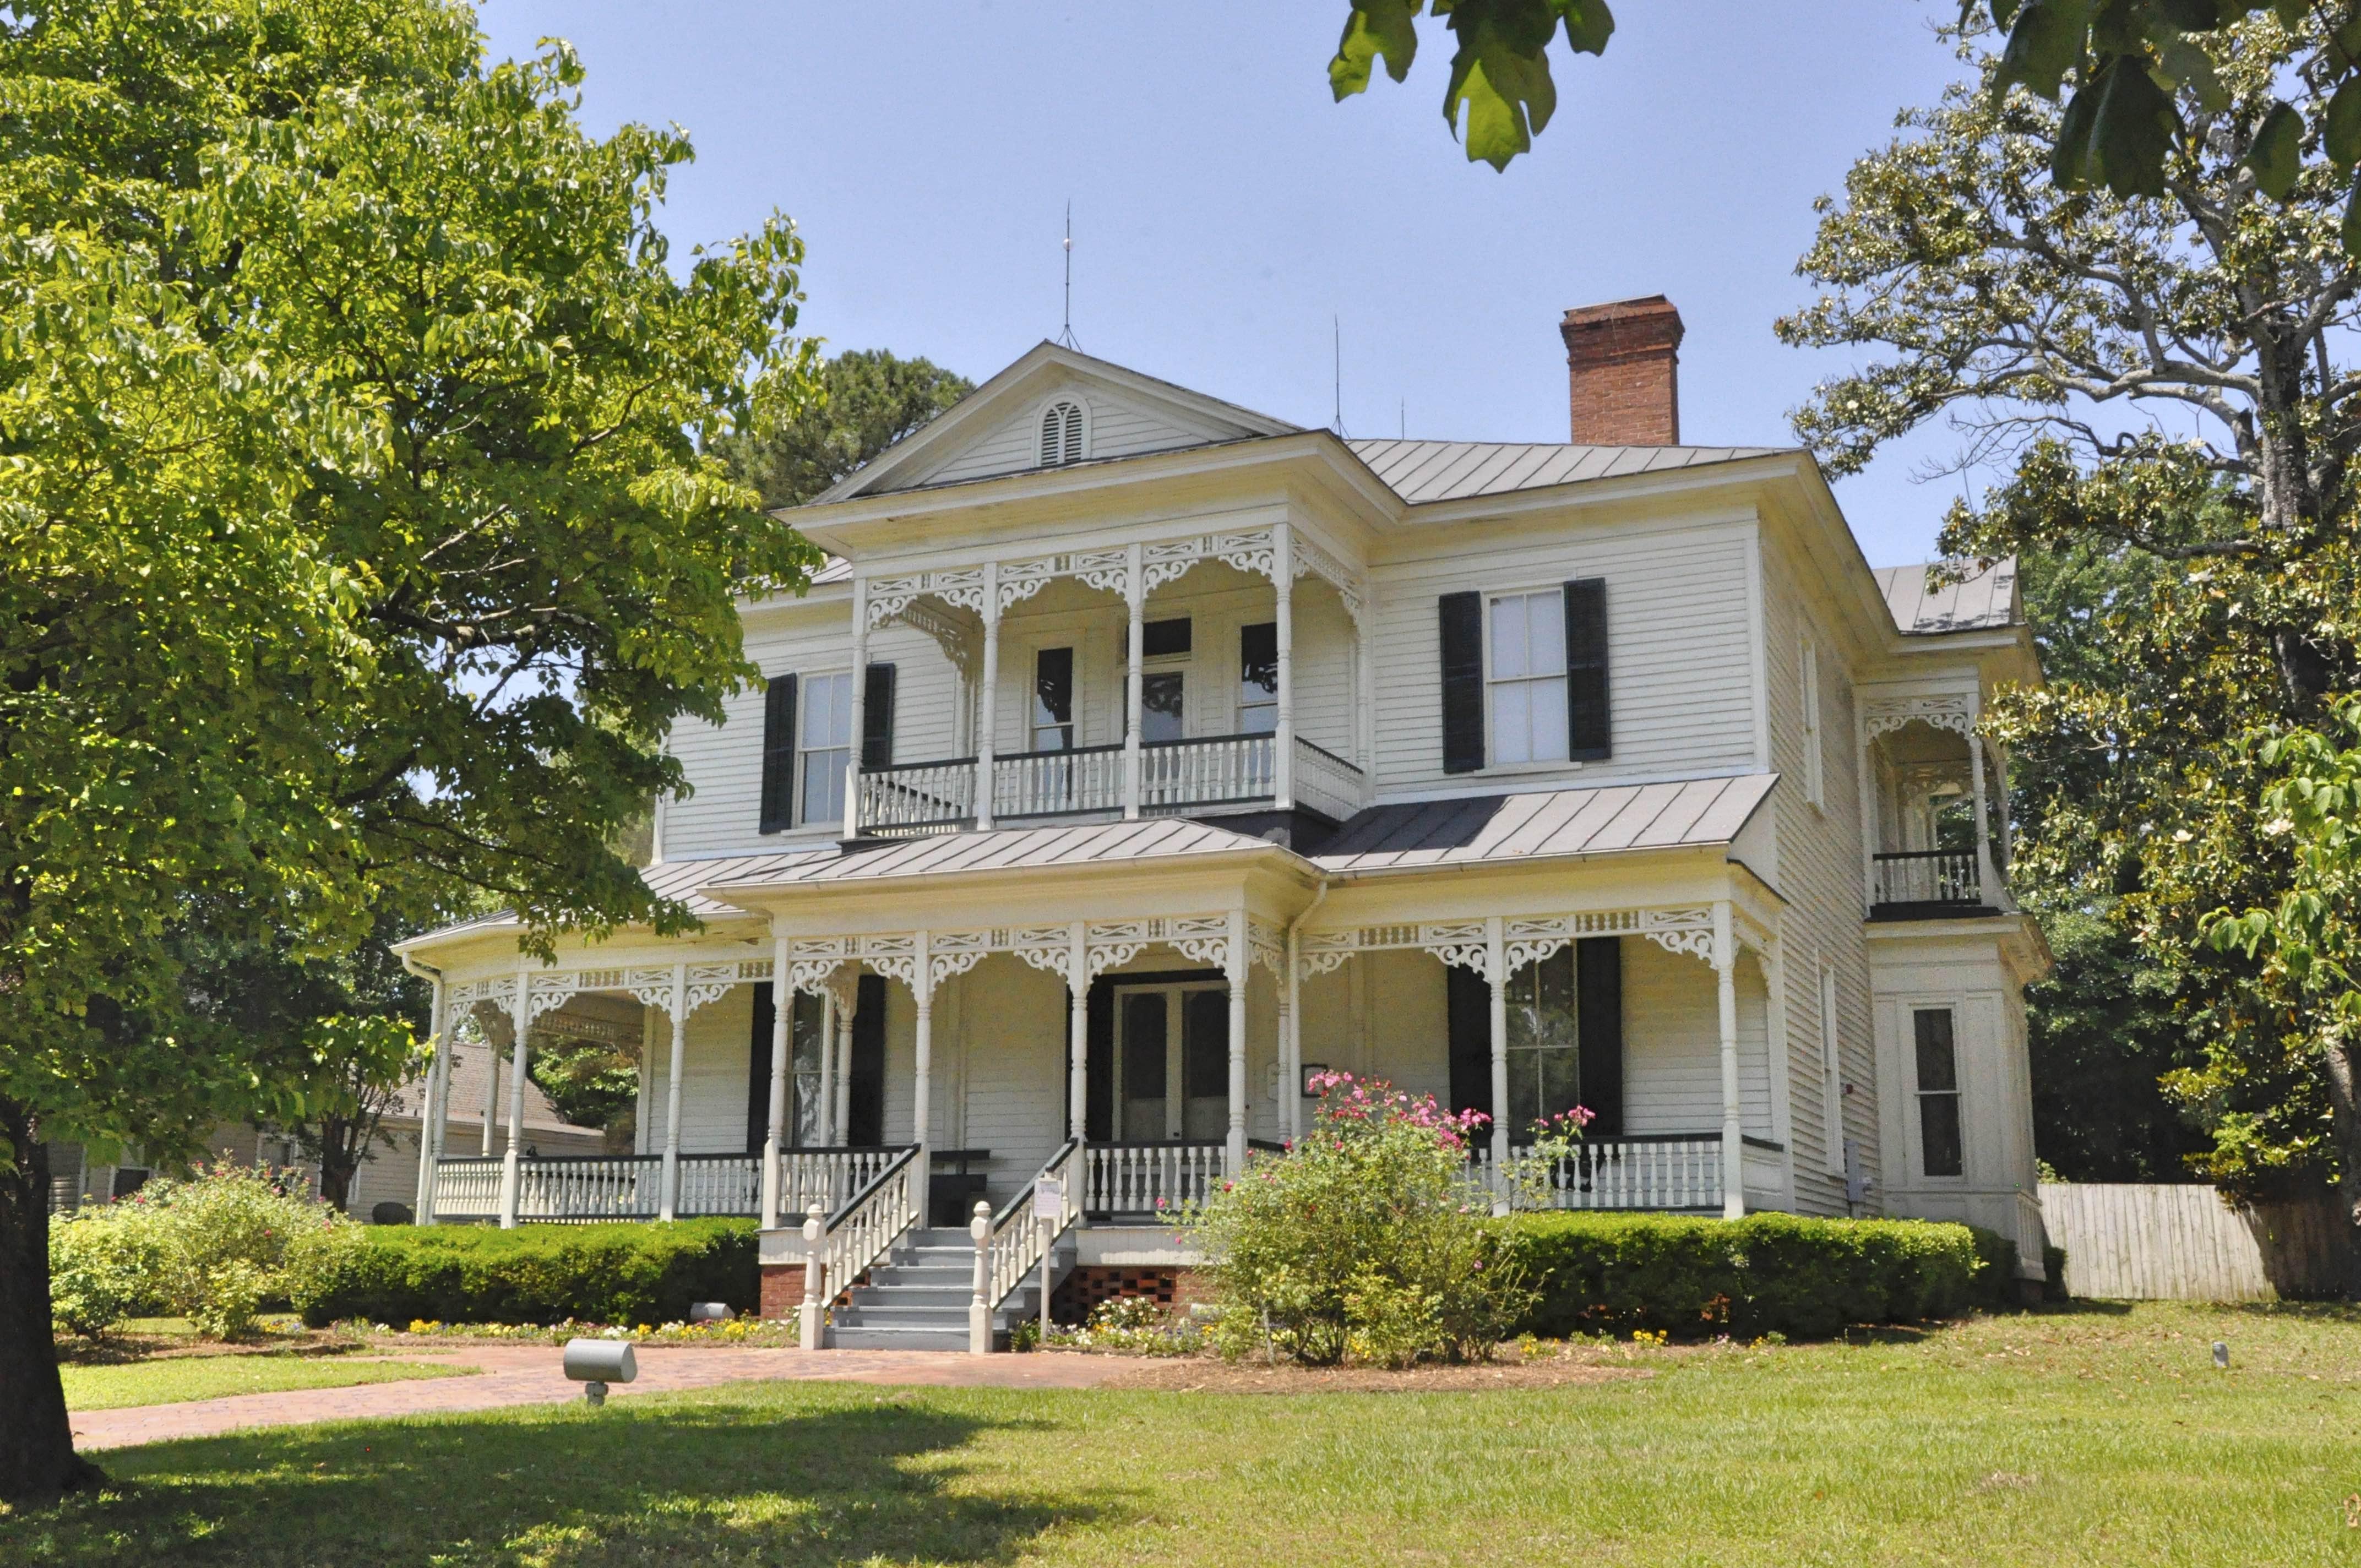 Edgar Allan Poe's House, Fayetteville, North Carolina | The